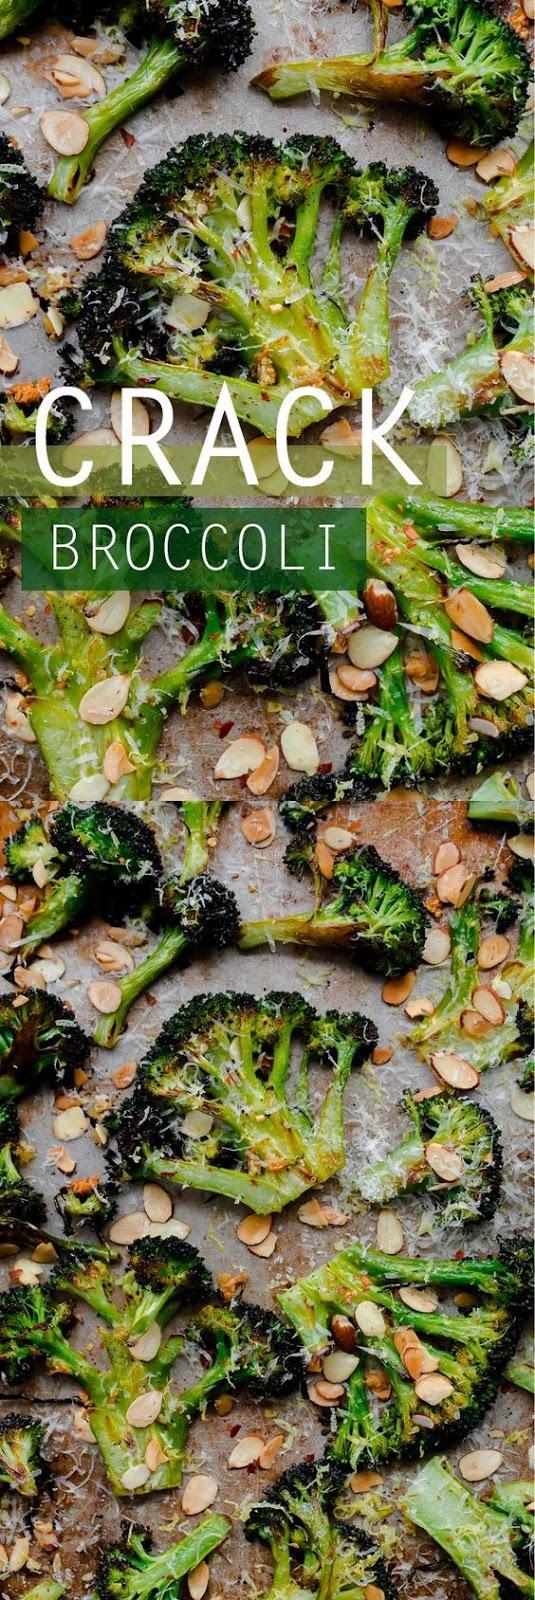 CRACK BROCCOLI (BEST ROASTED BROCCOLI RECIPE) #crack #broccoli #roasted #vegetarian #vegetarianrecipes #veggies #vegan #veganrecipes